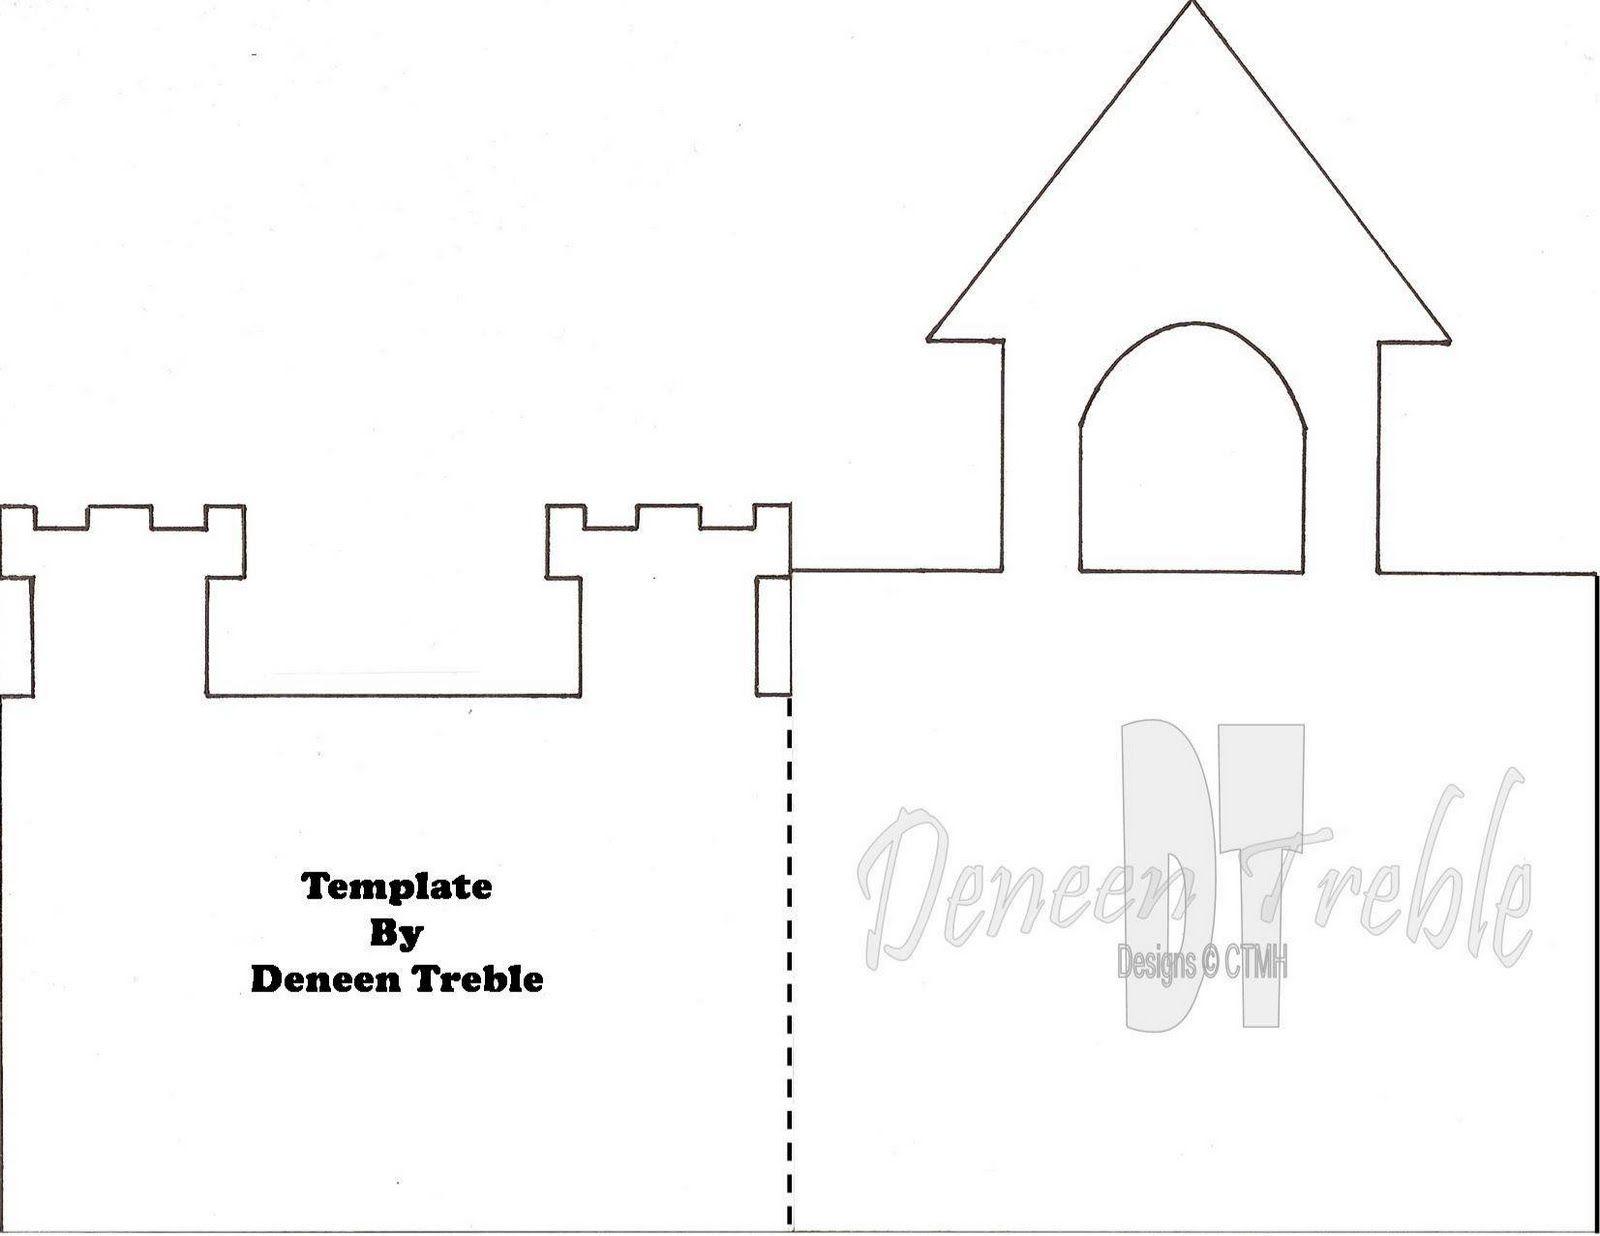 Castle+Piece1+Deneen+Treble1.jpg]   princesas   Pinterest ...